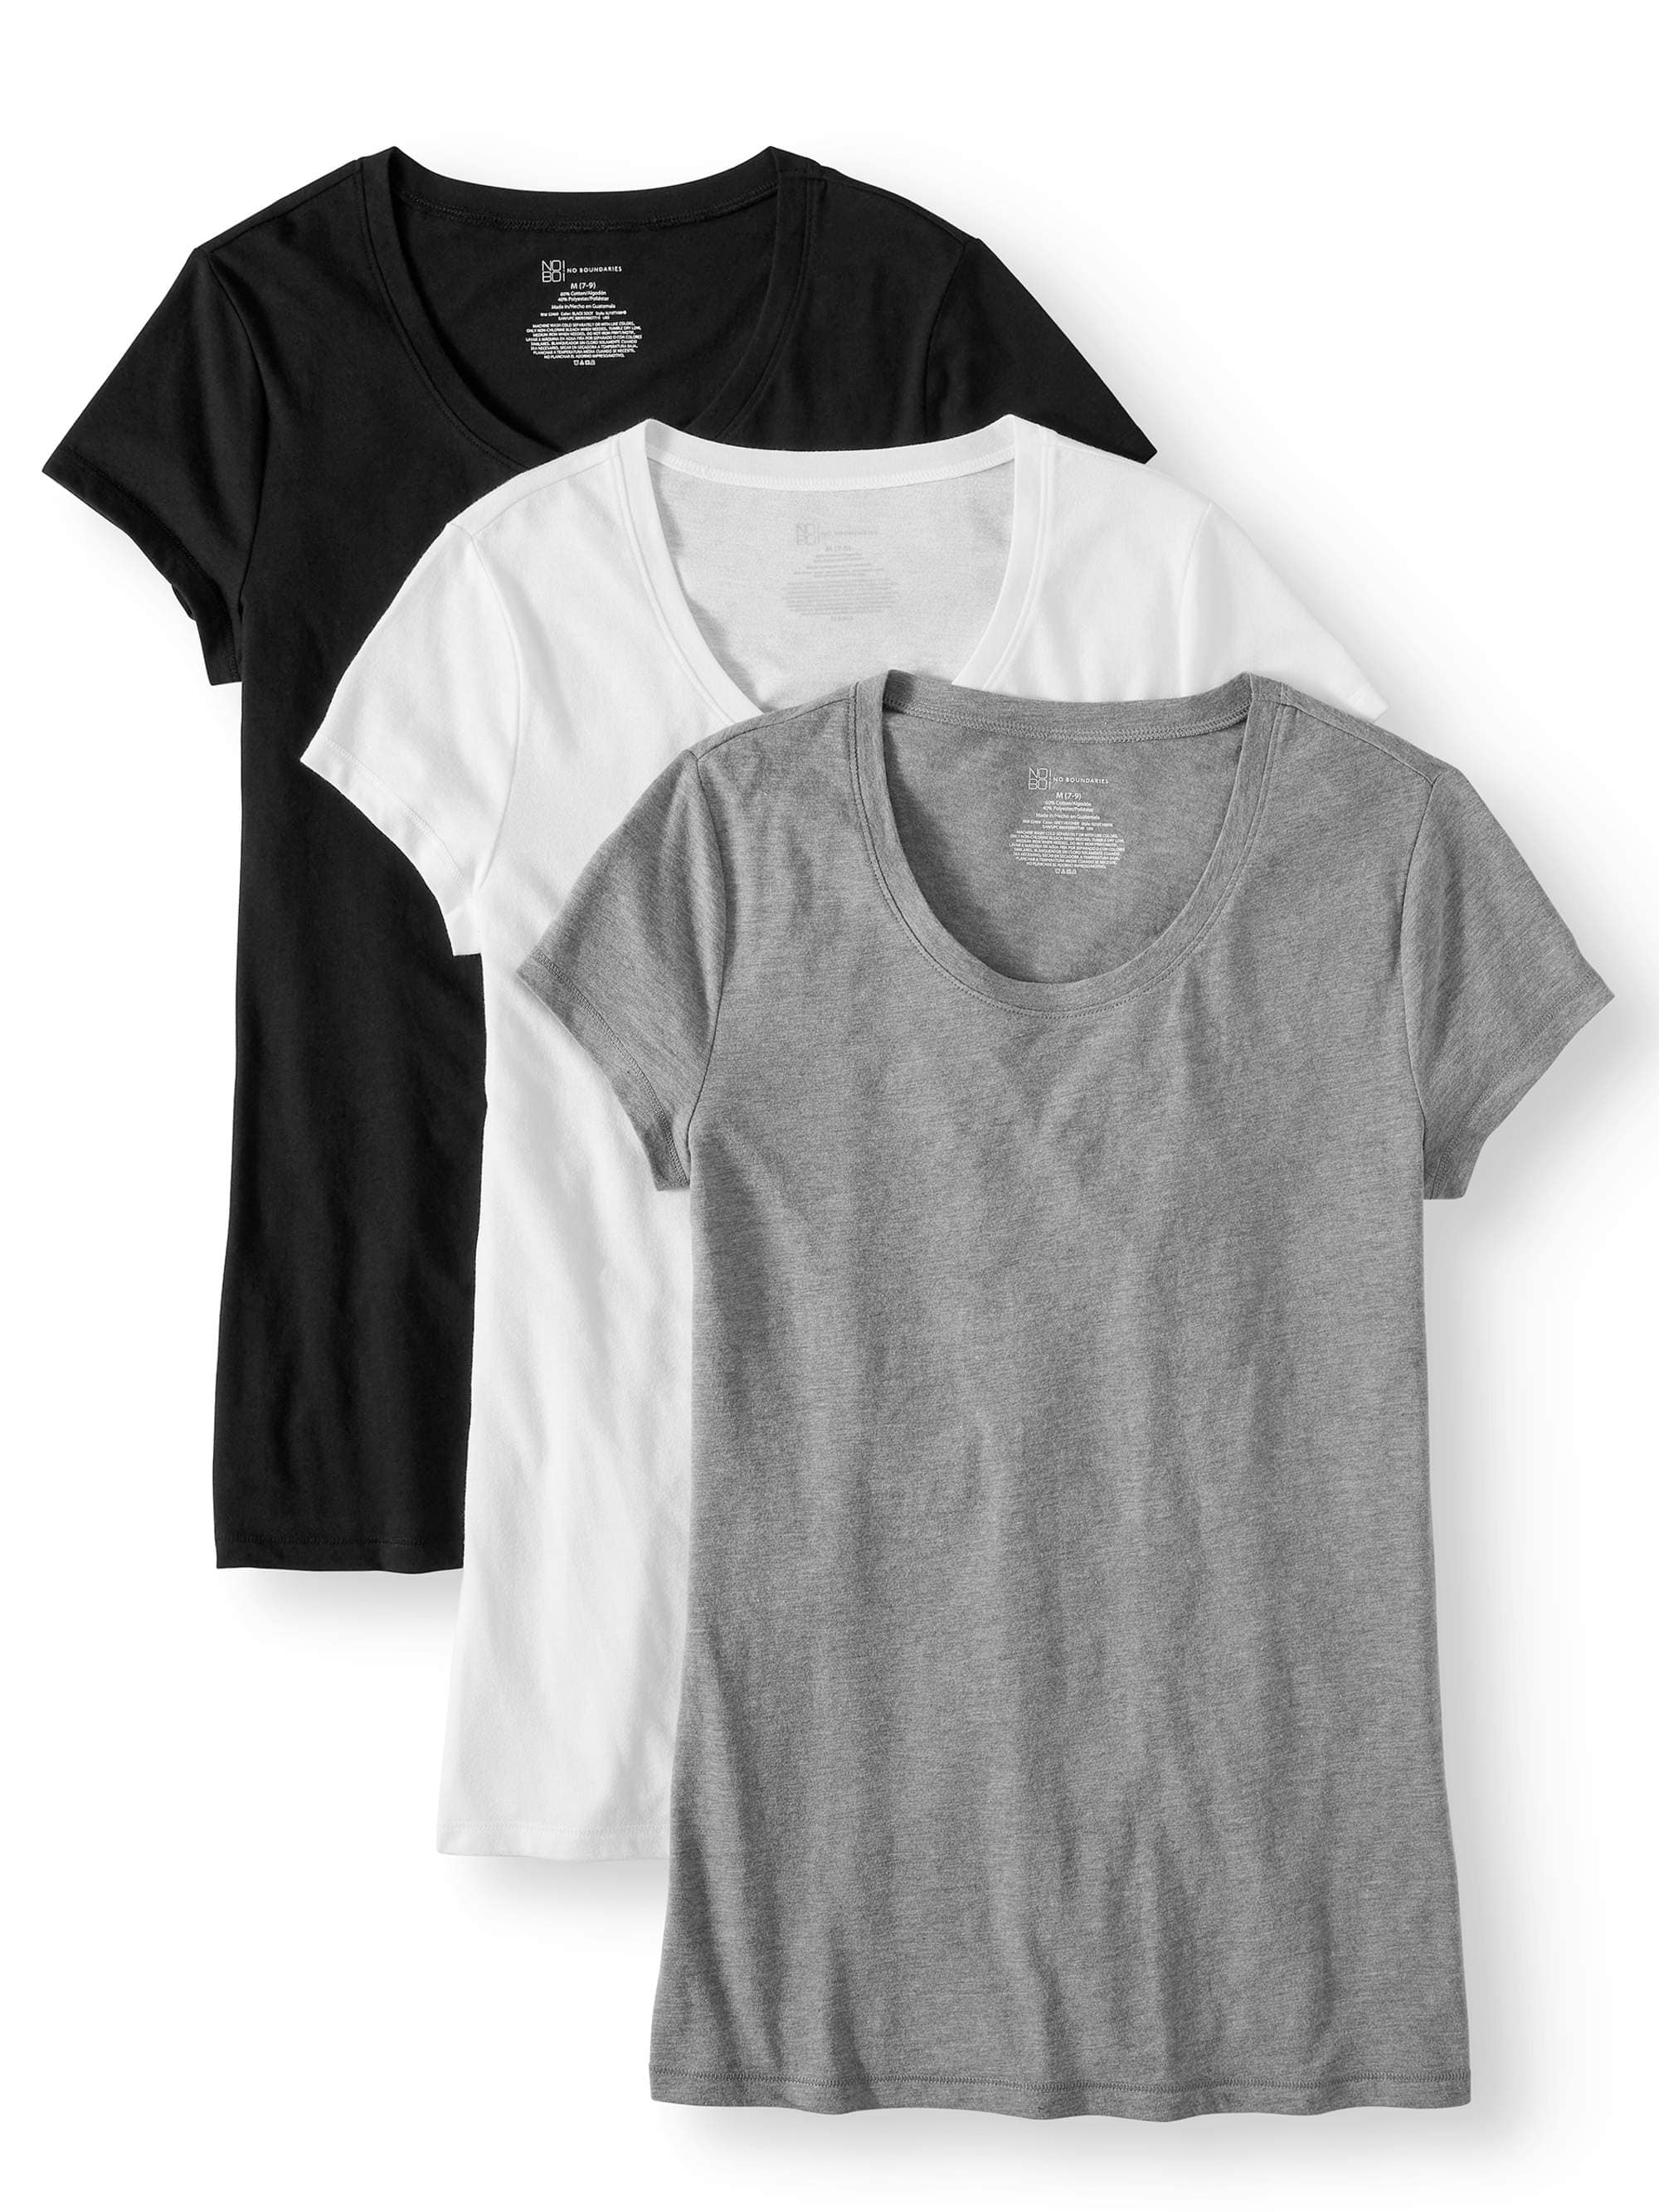 No Boundaries Women's Short Sleeve T-Shirt (3-Pack) $8.50